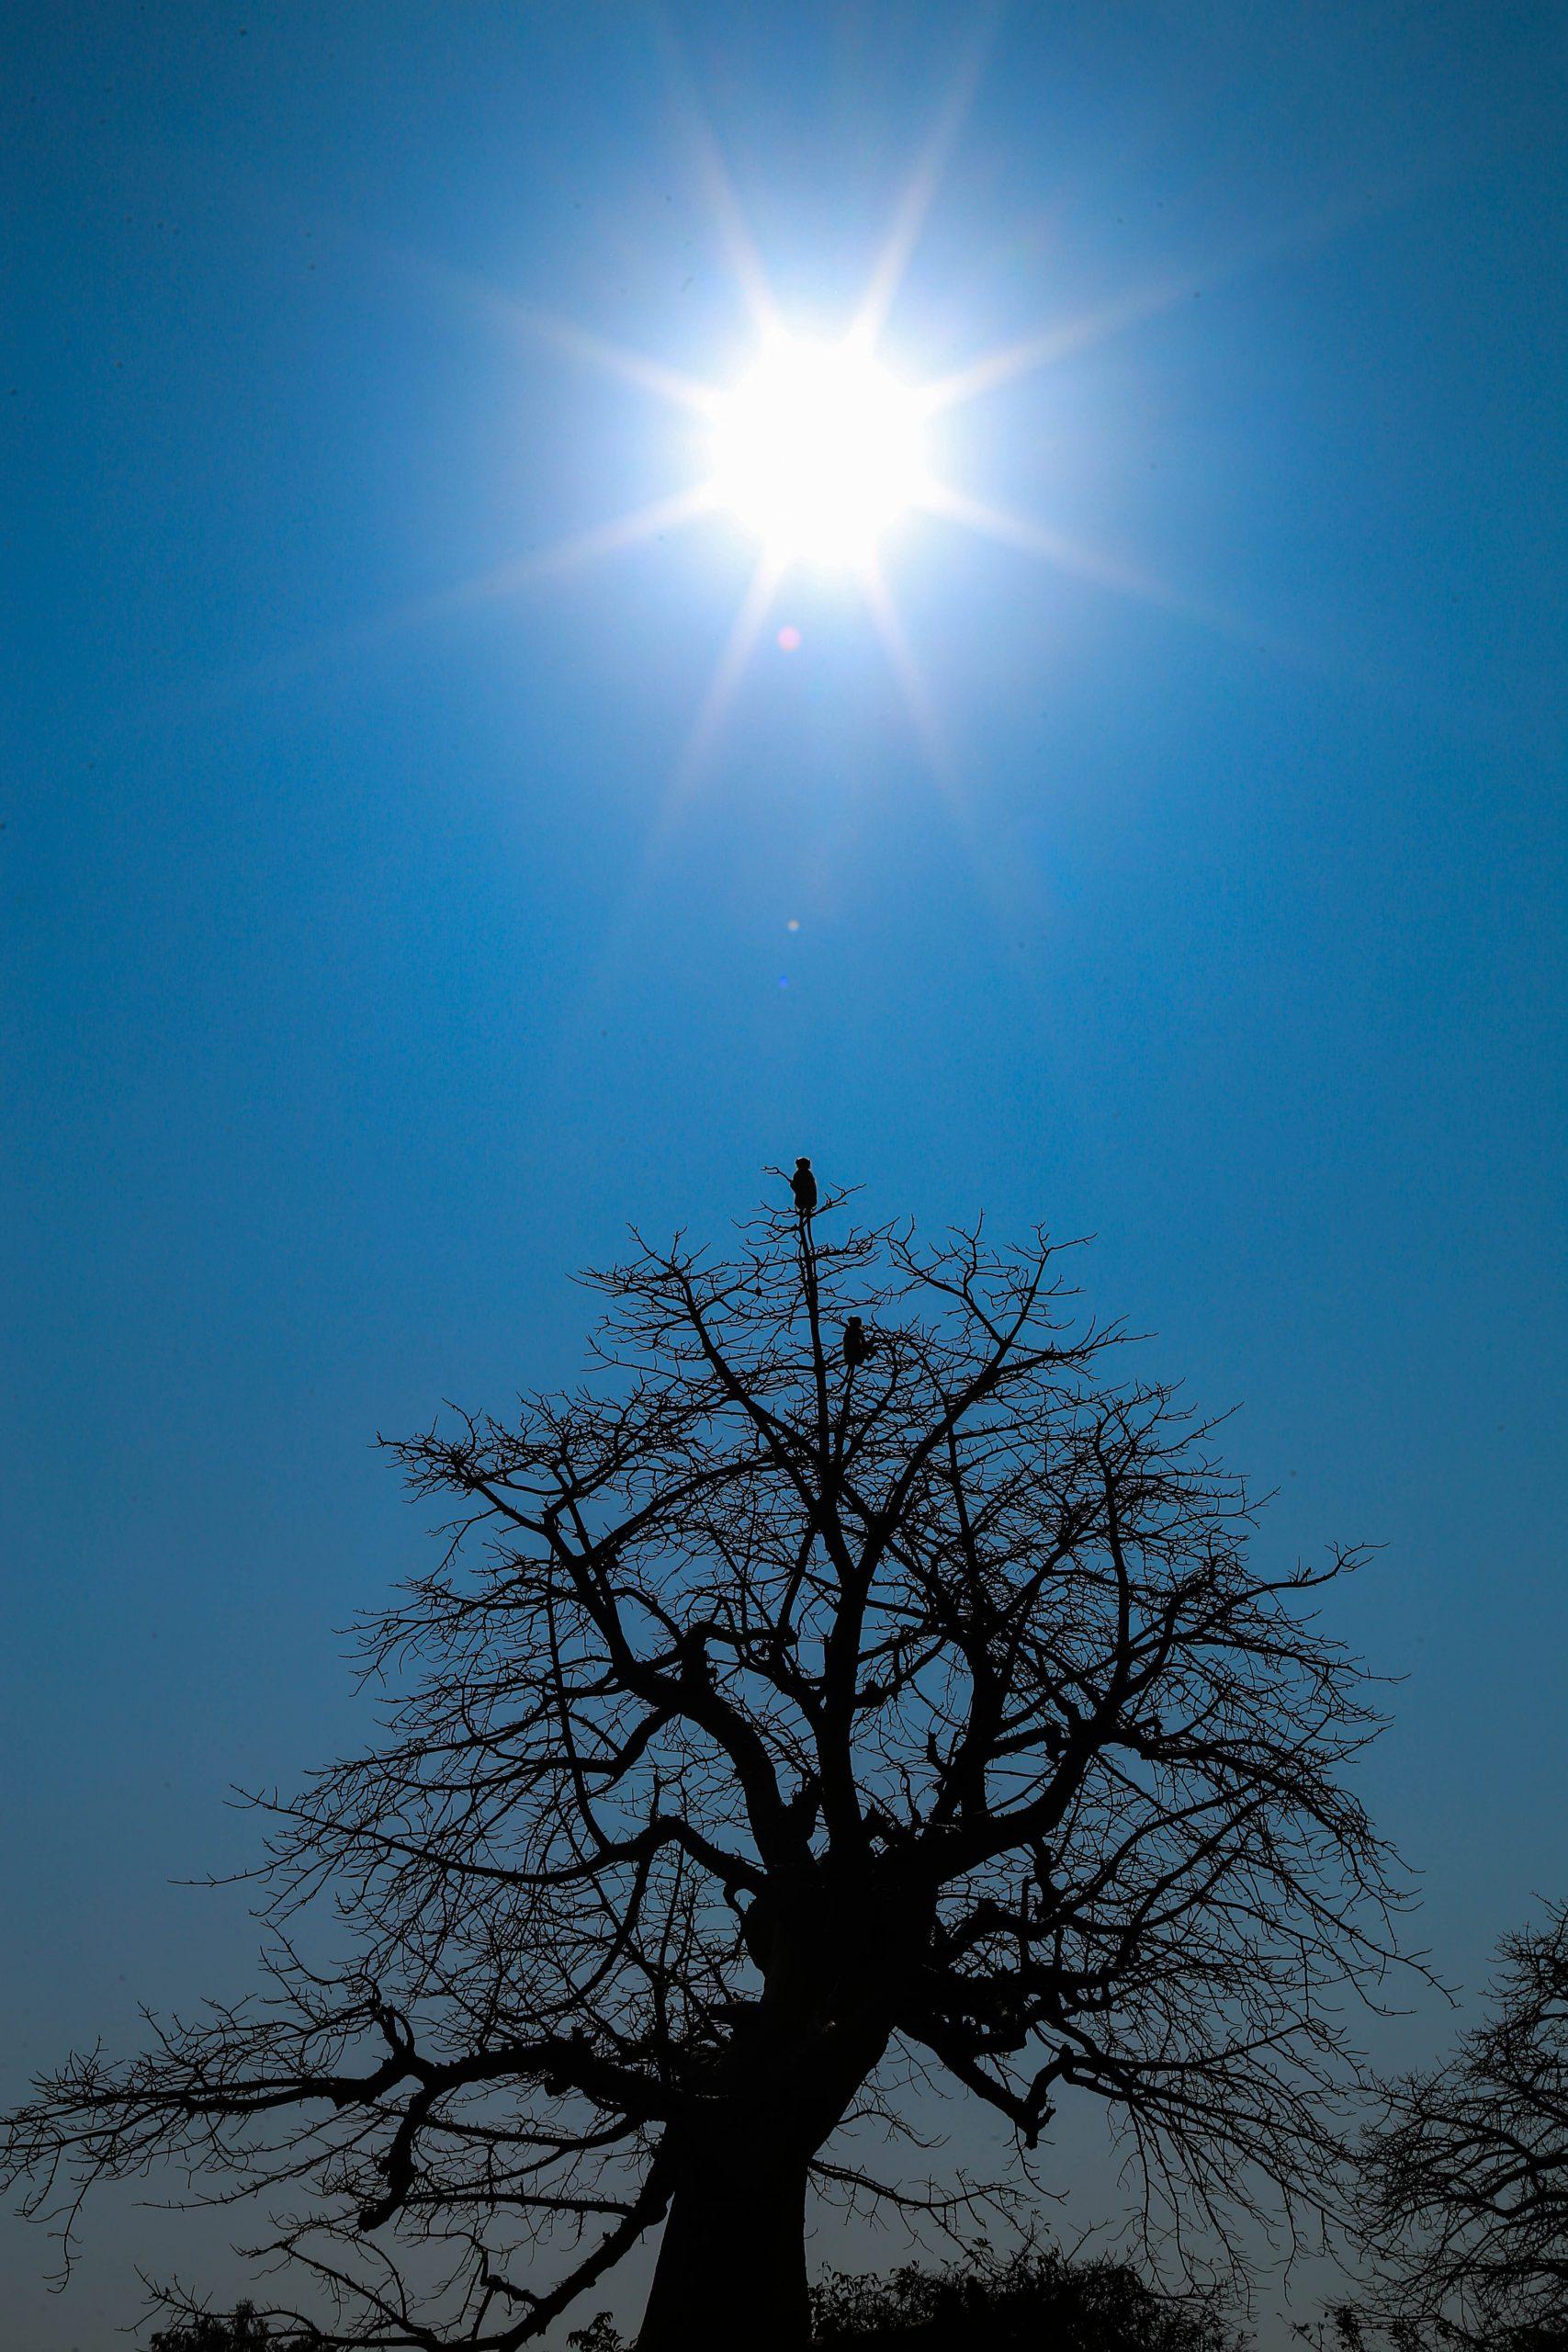 Sun shining over the tree